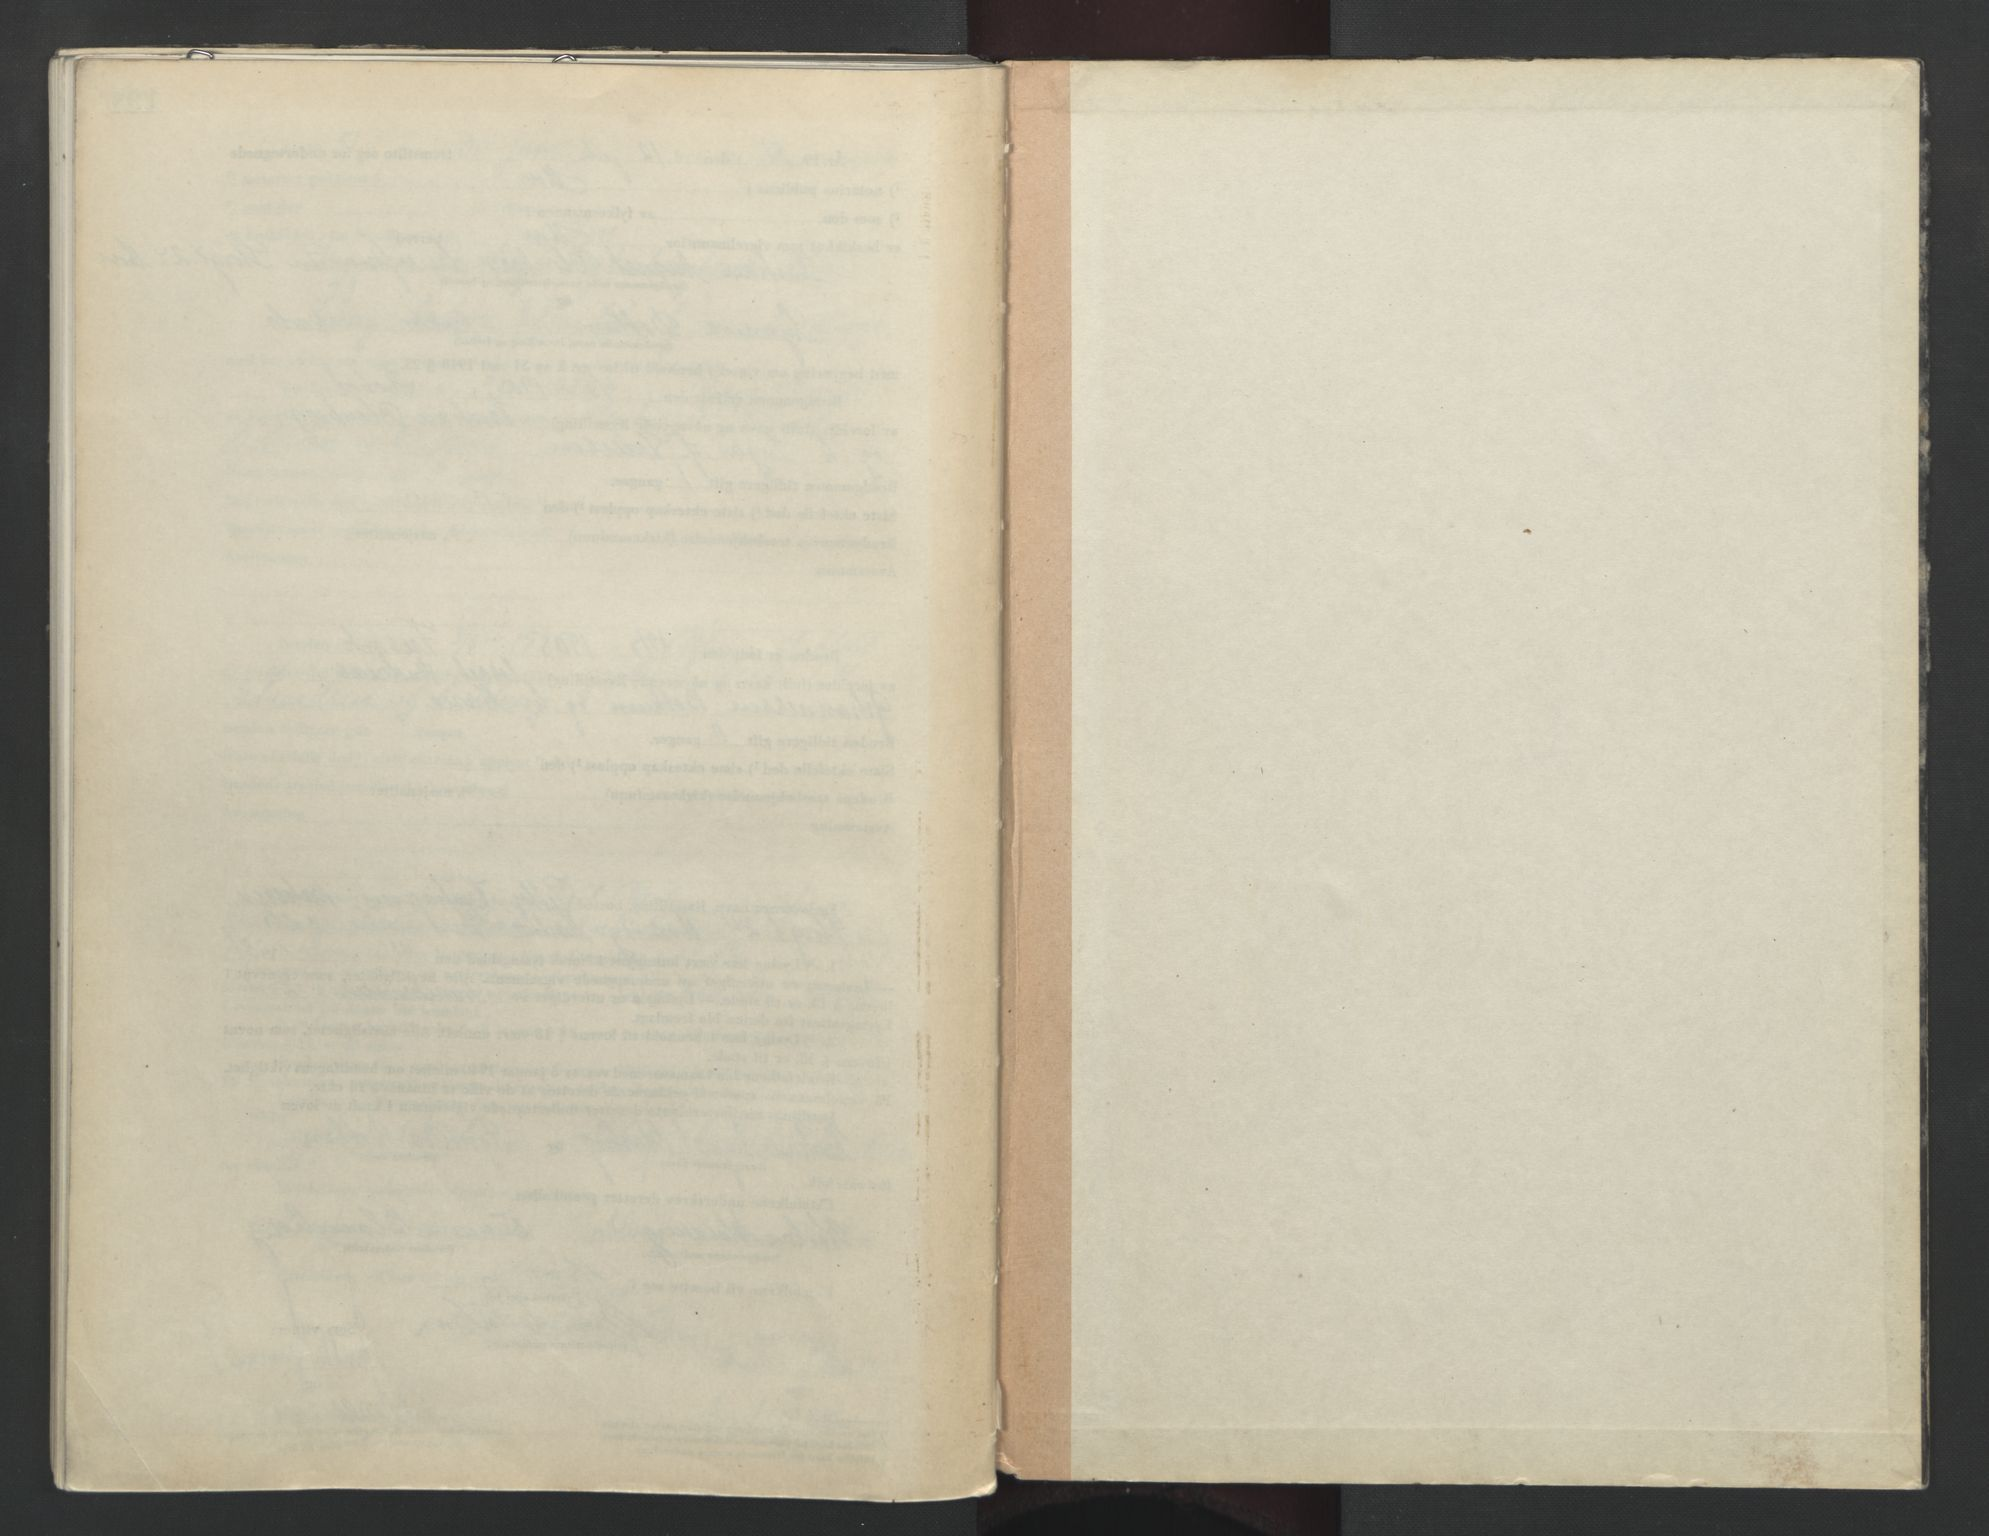 SAO, Moss sorenskriveri, 1948-1951, s. upaginert